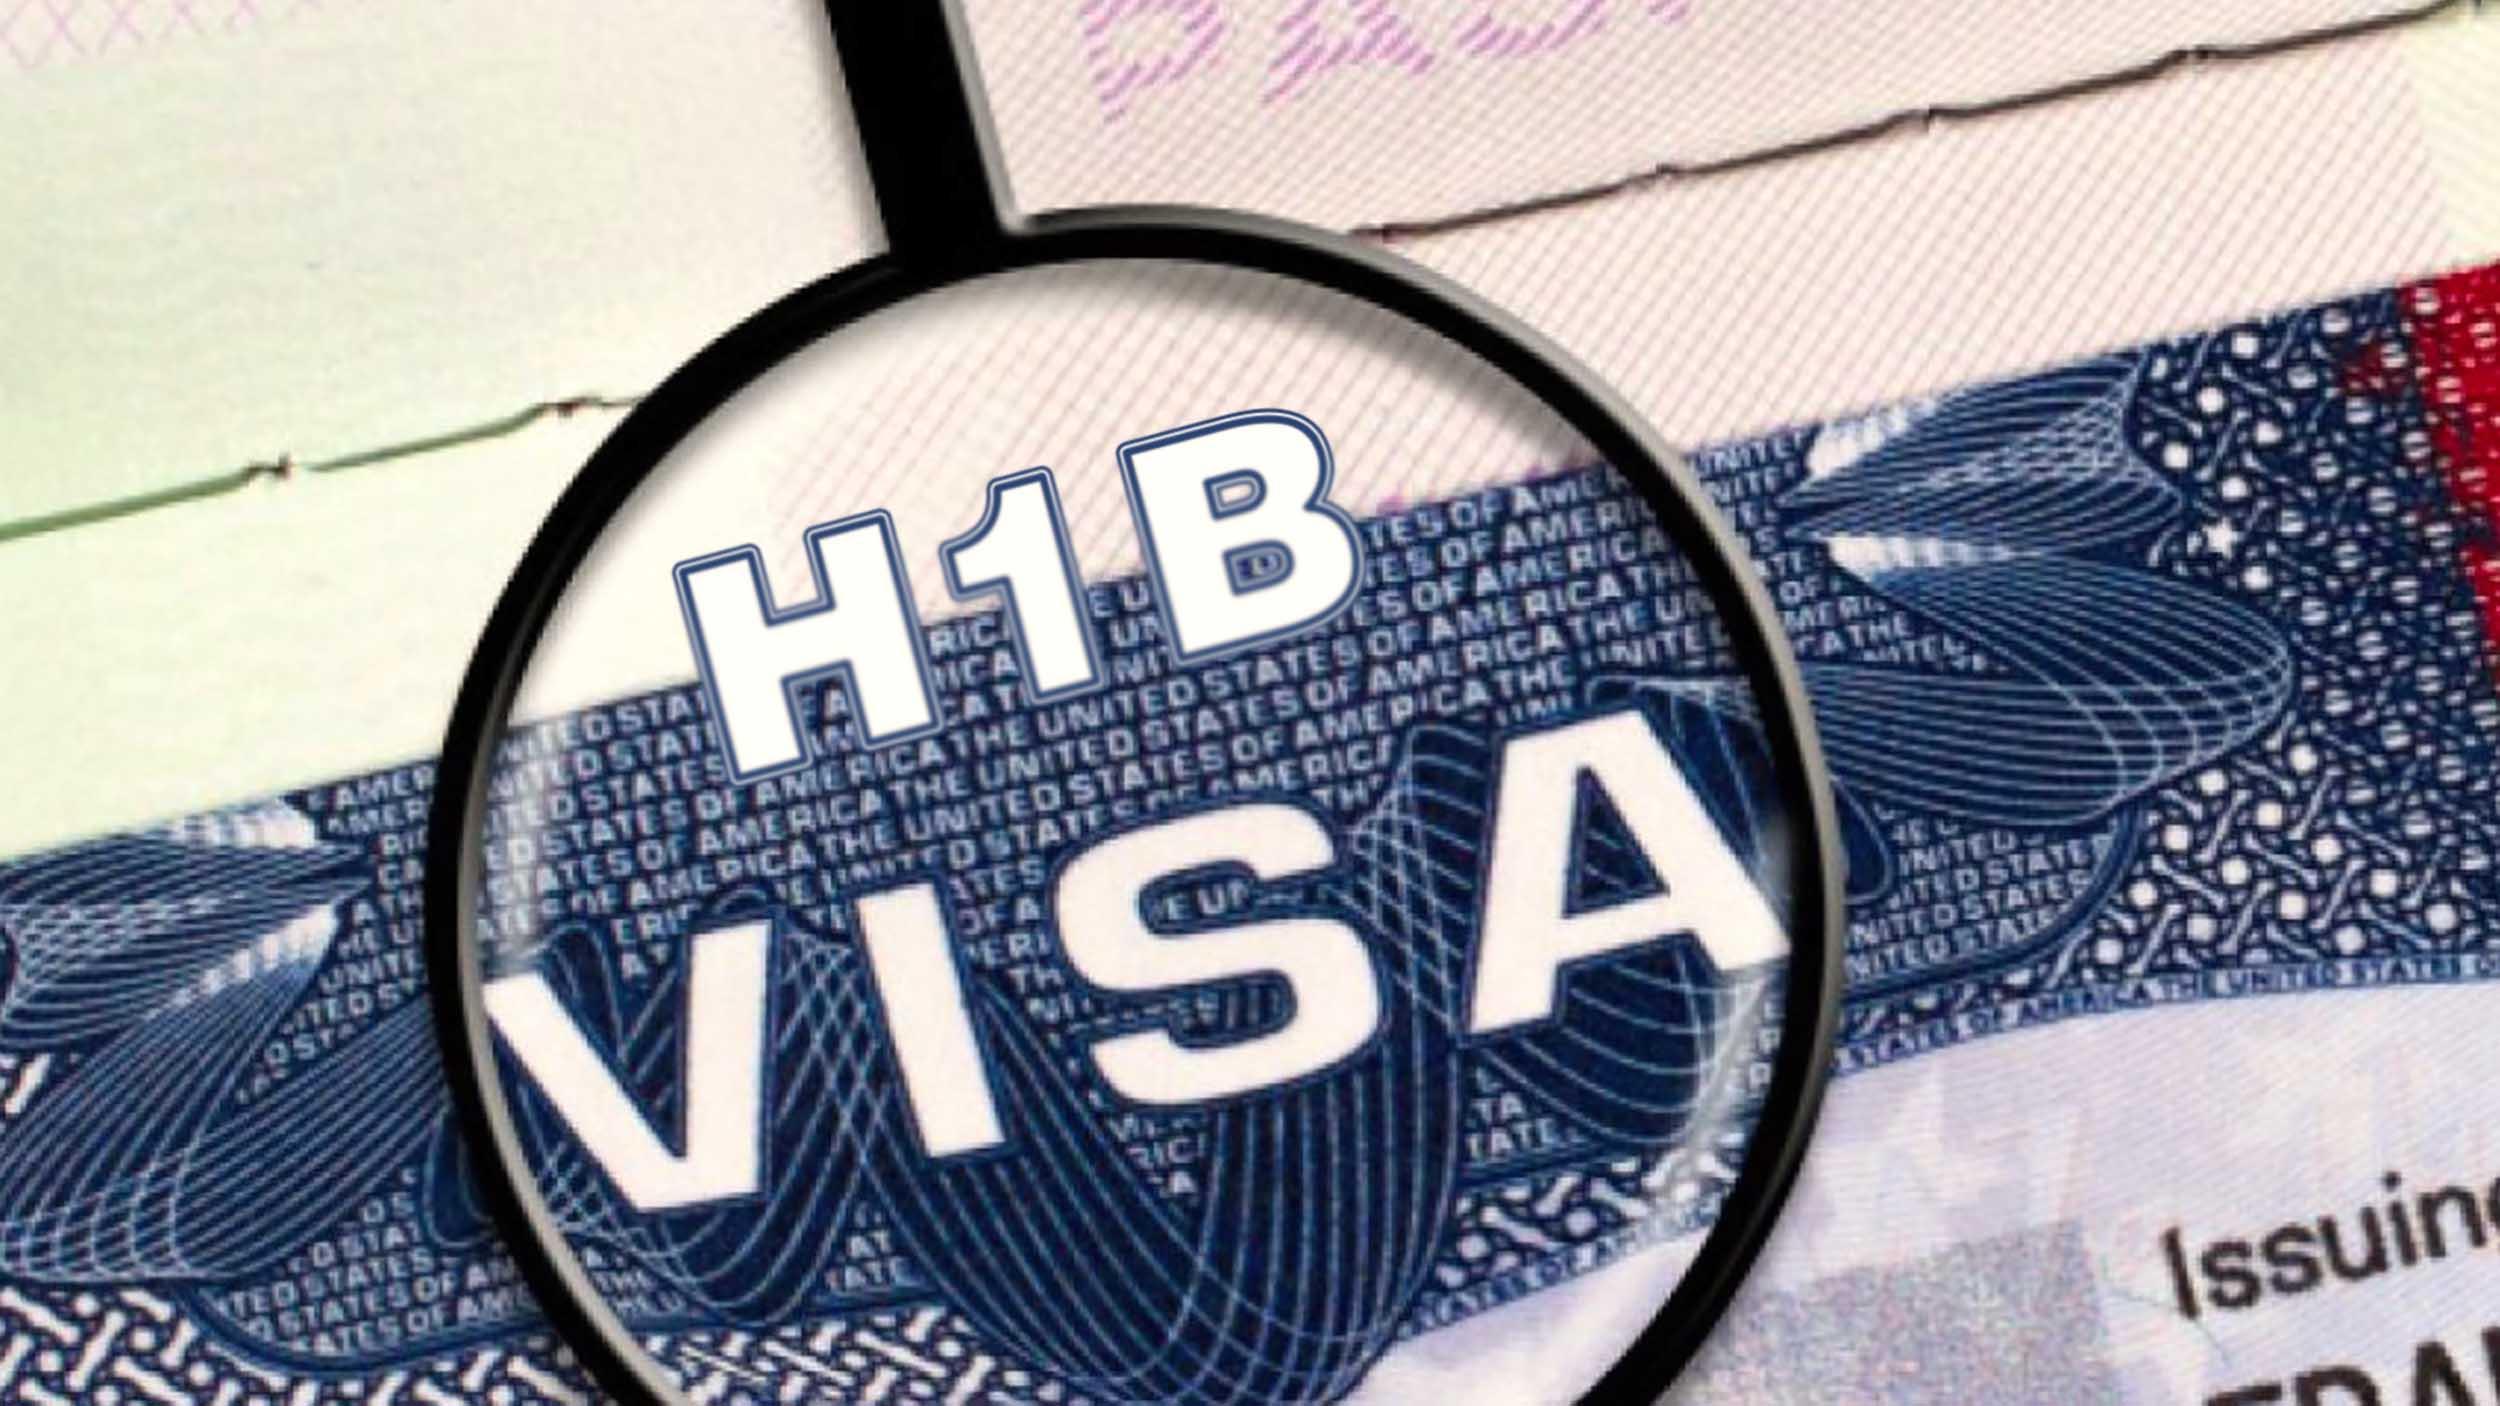 H1B Deportation: Can DHS Stop Extending H1B Visas? | Chudnovsky Law